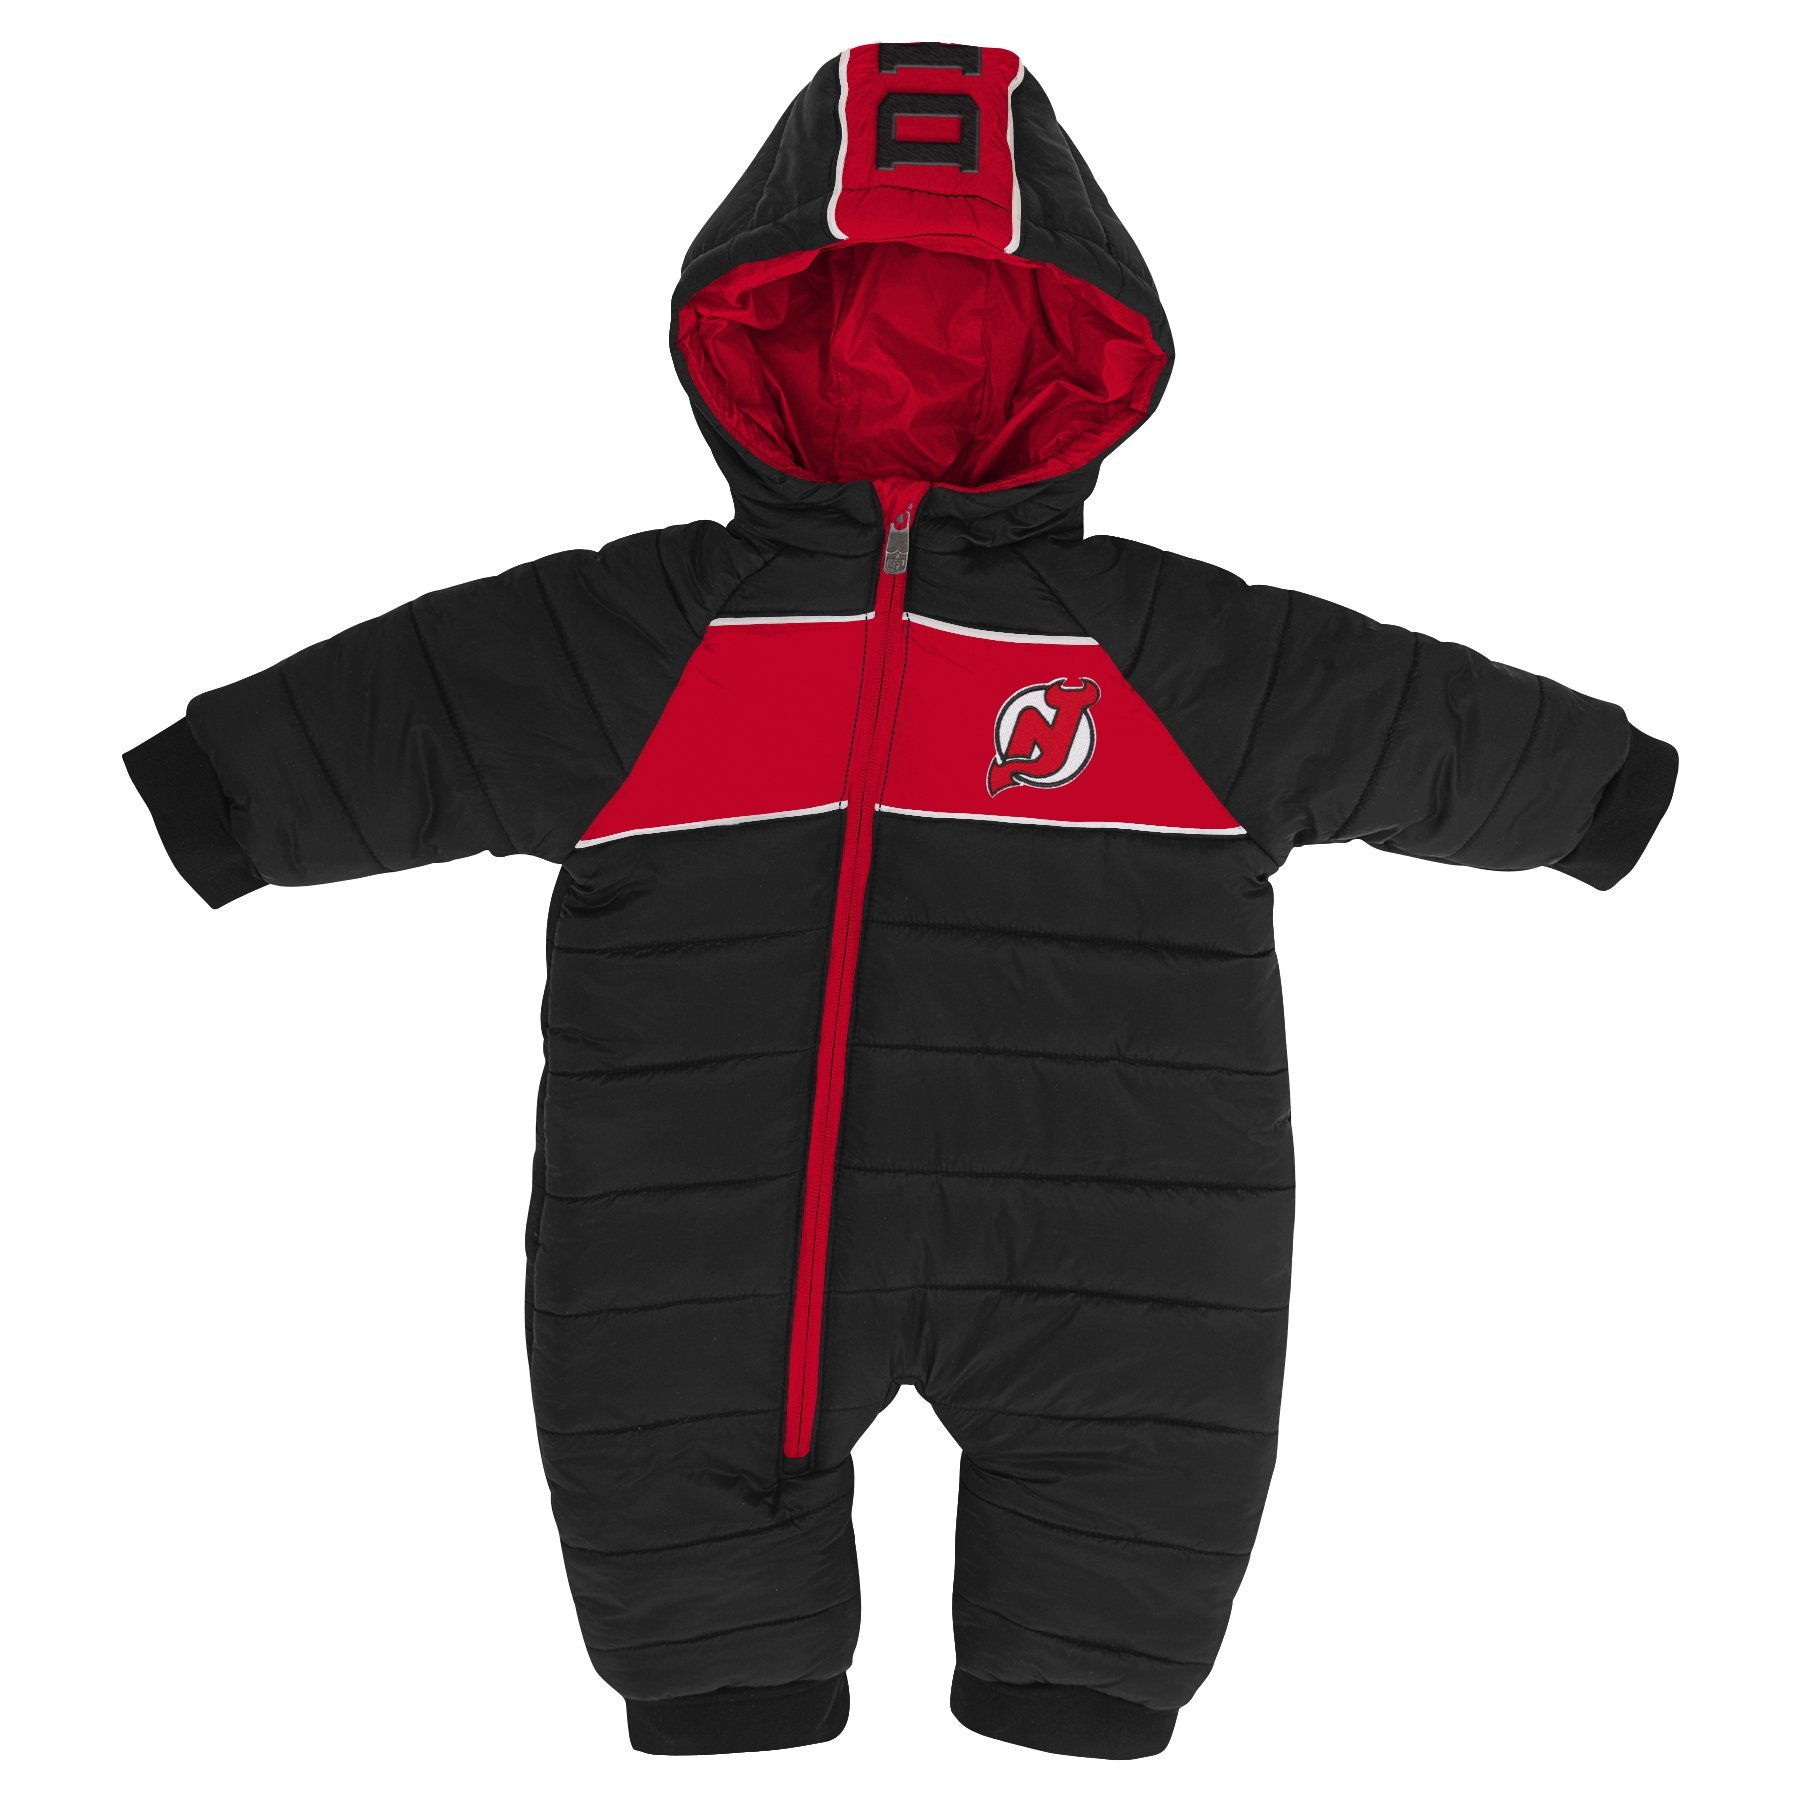 quality design c1c57 69618 Details about Outerstuff NHL New Jersey Devils Newborn & Infant Puck Drop  Puffer Bodysuit, B..